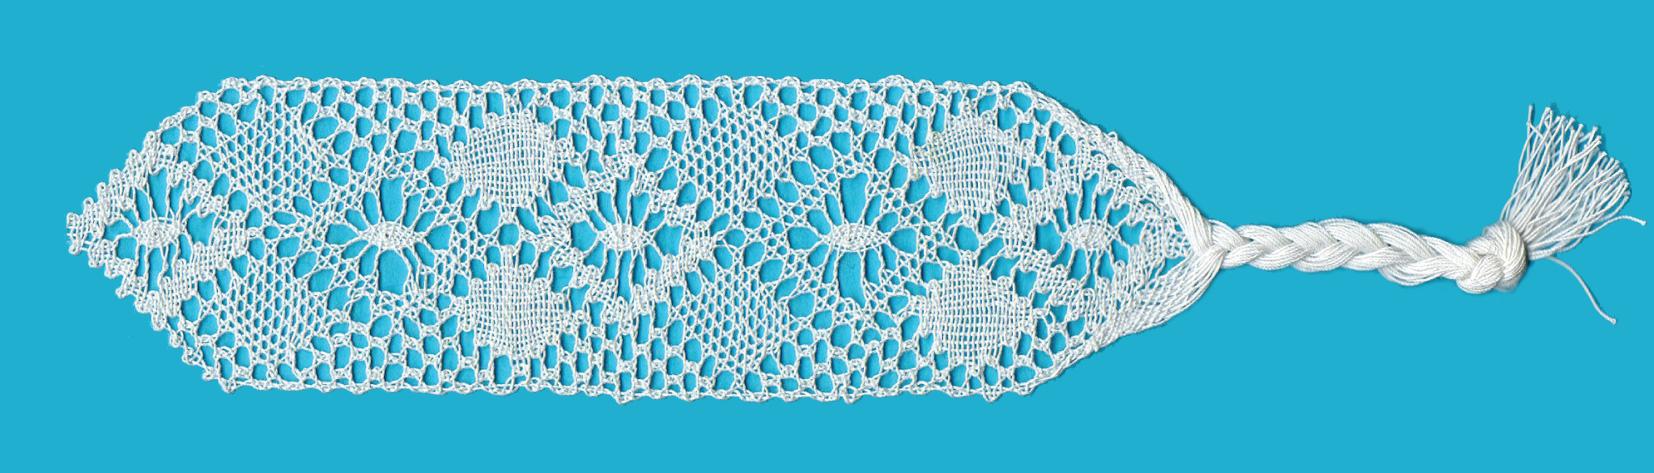 Free bobbin lace patterns.